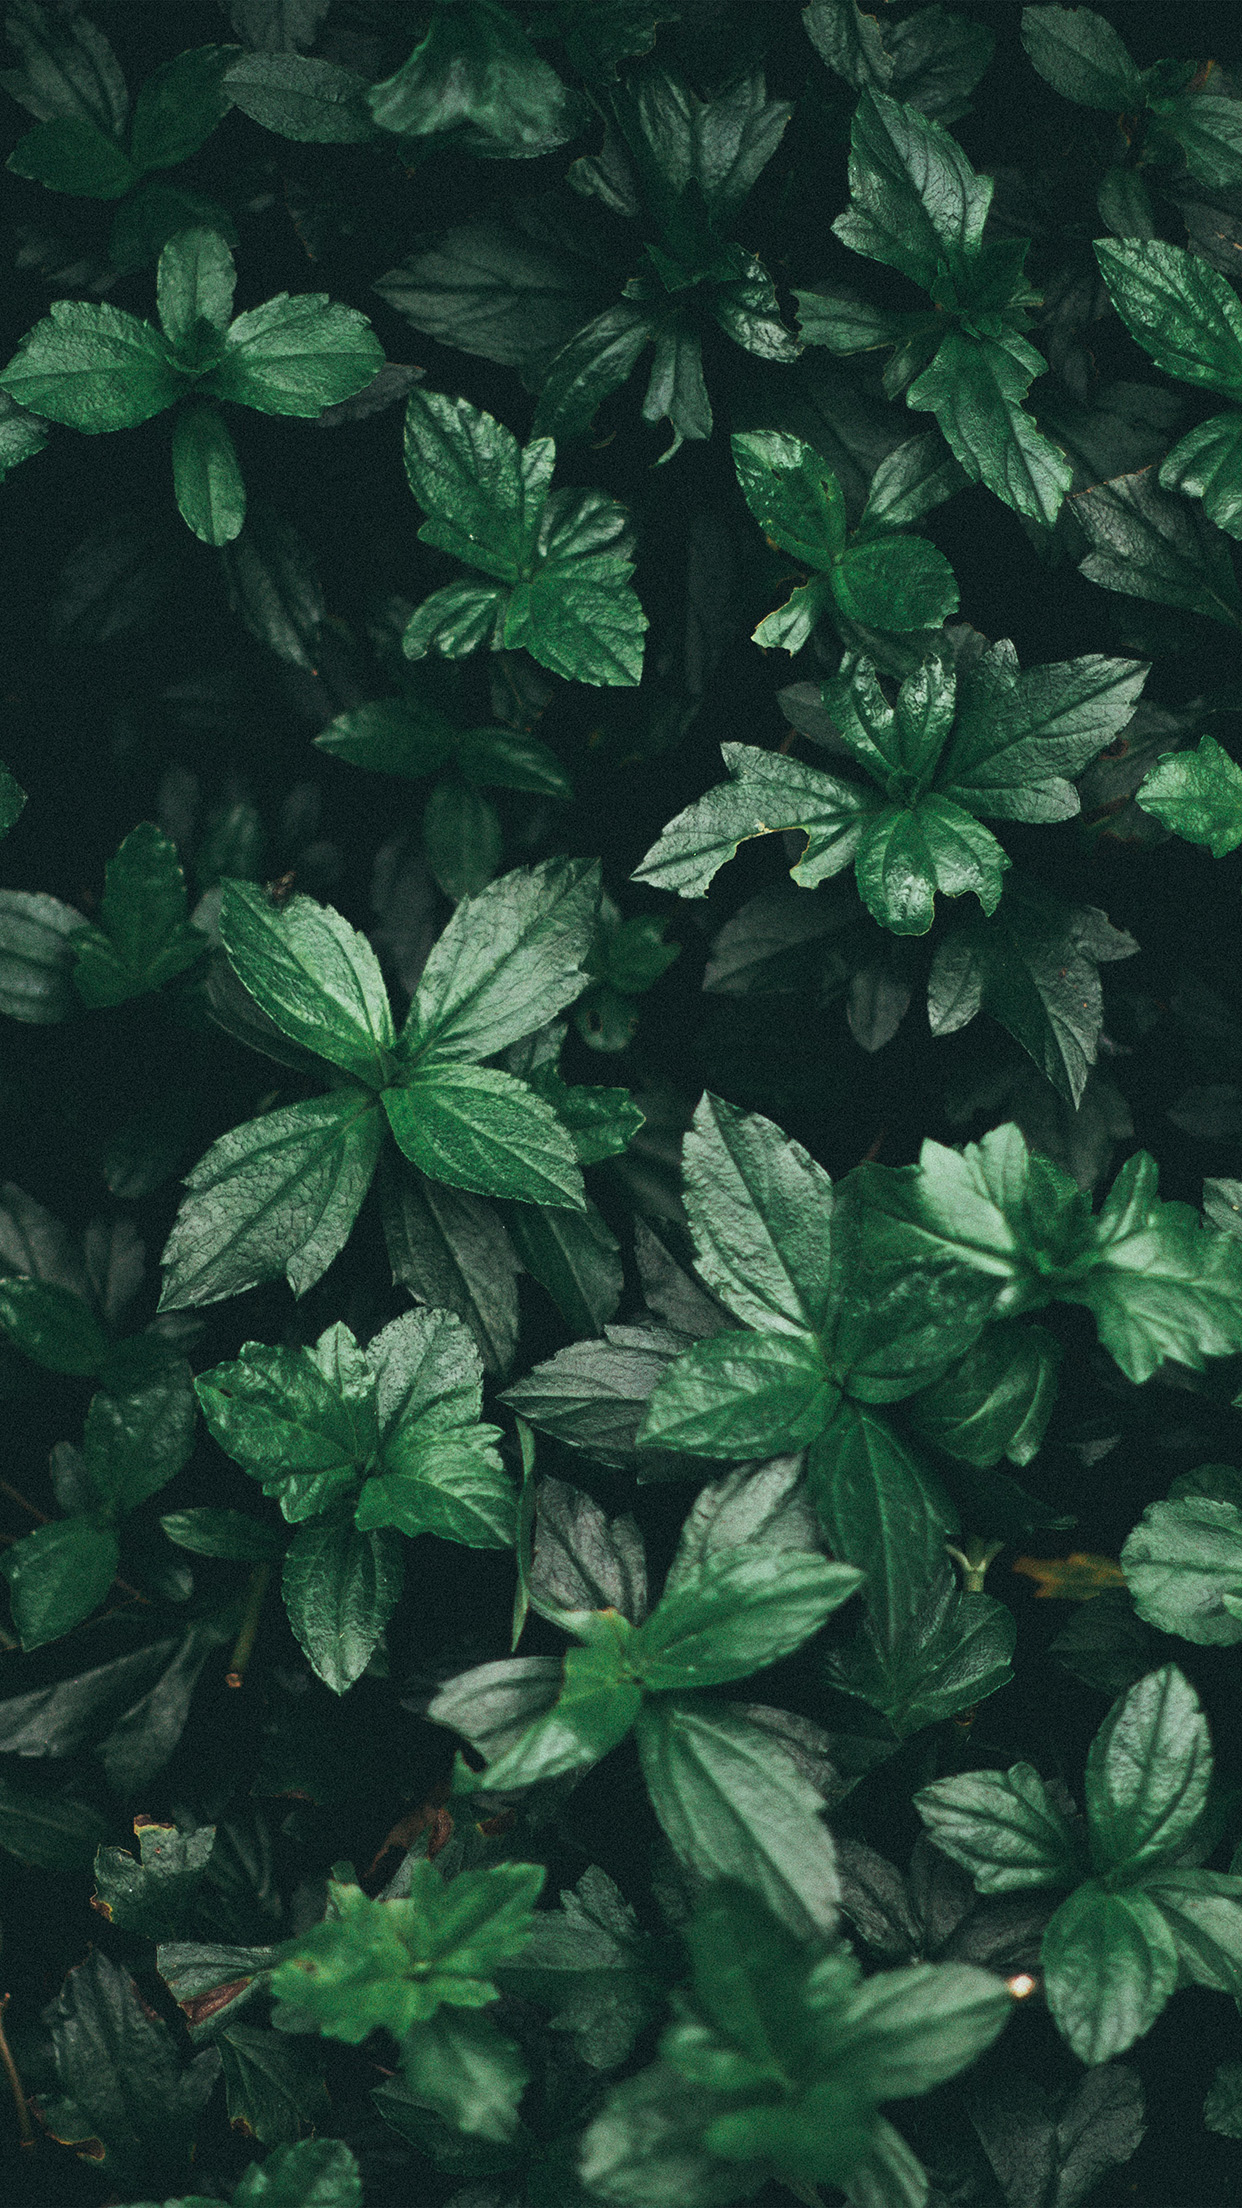 Iphone7papers Com Iphone7 Wallpaper Nz14 Leaf Summer Dark Tree